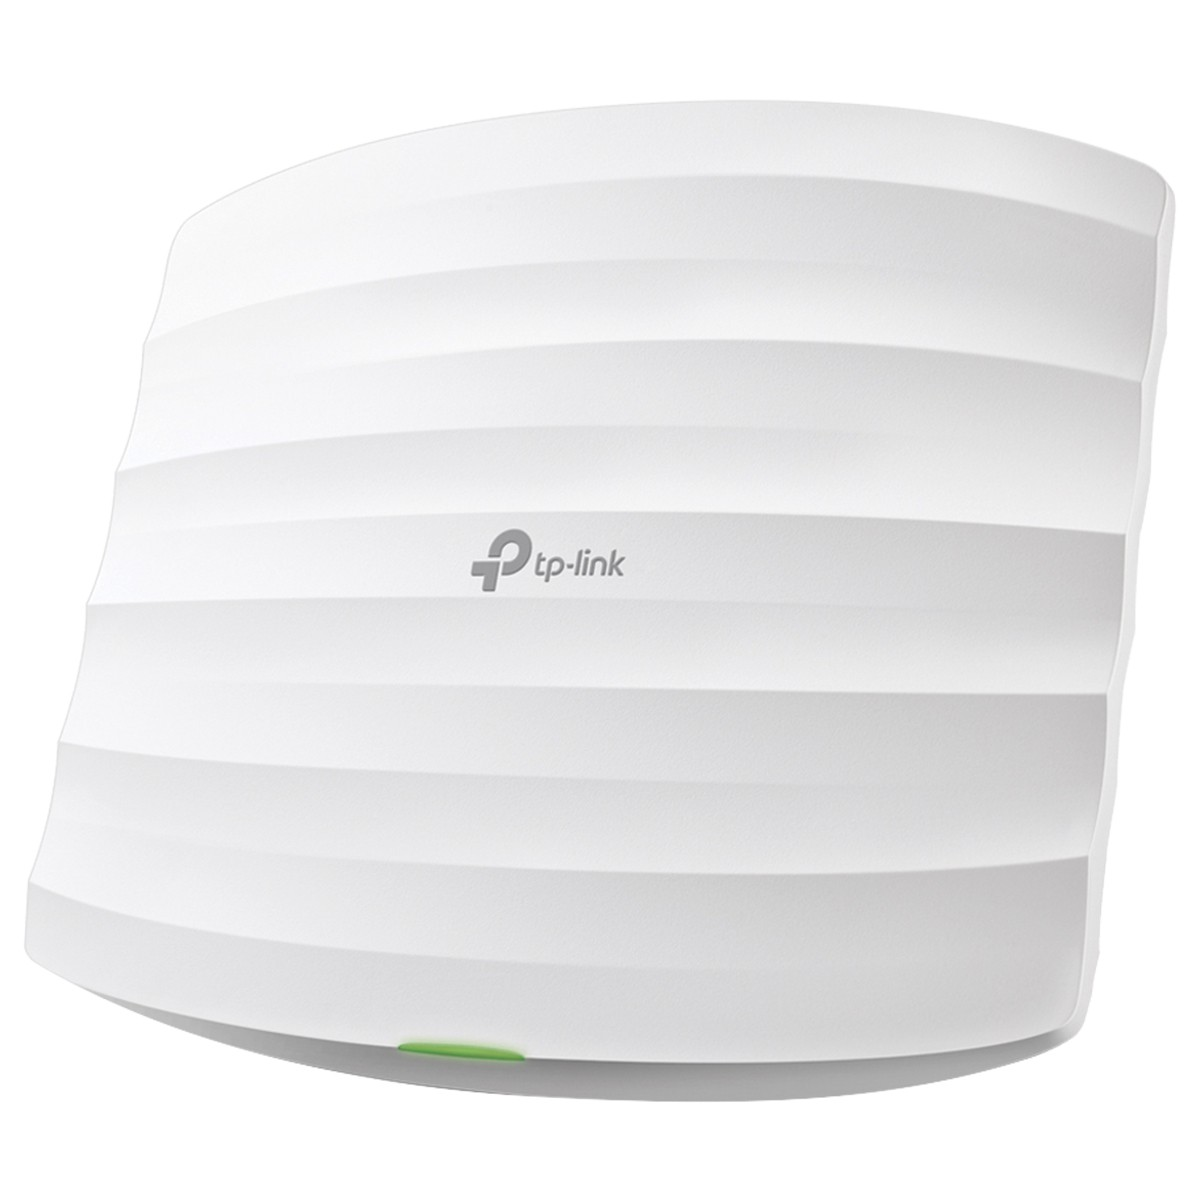 Access Point Wireless N 300MBPS Montavel em Teto EAP110